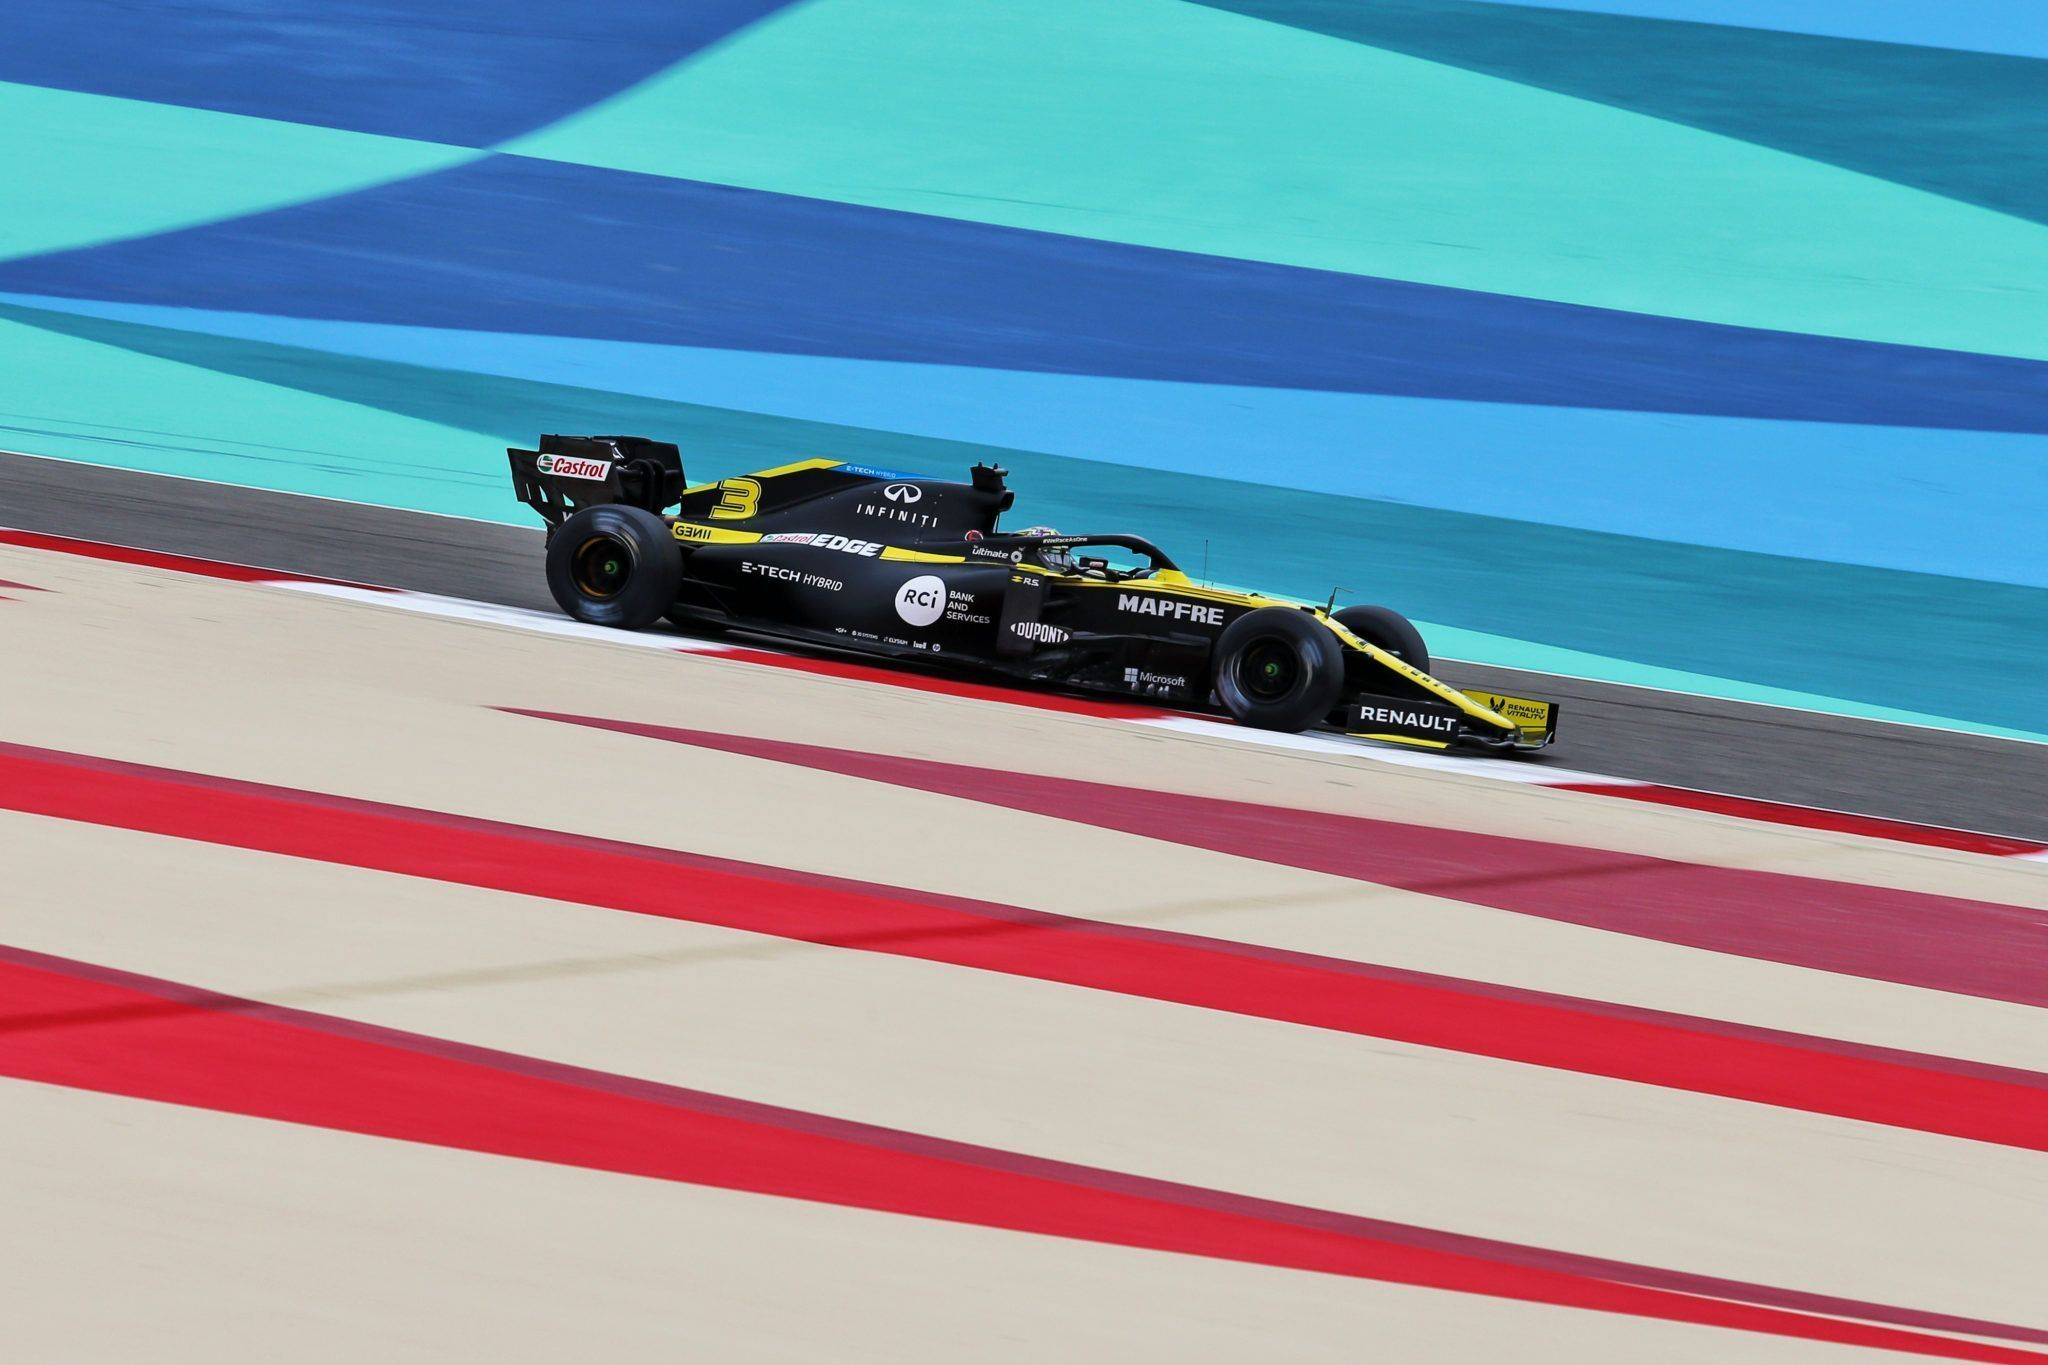 F1, Mario Isola, Pirelli, Daniel Ricciardo